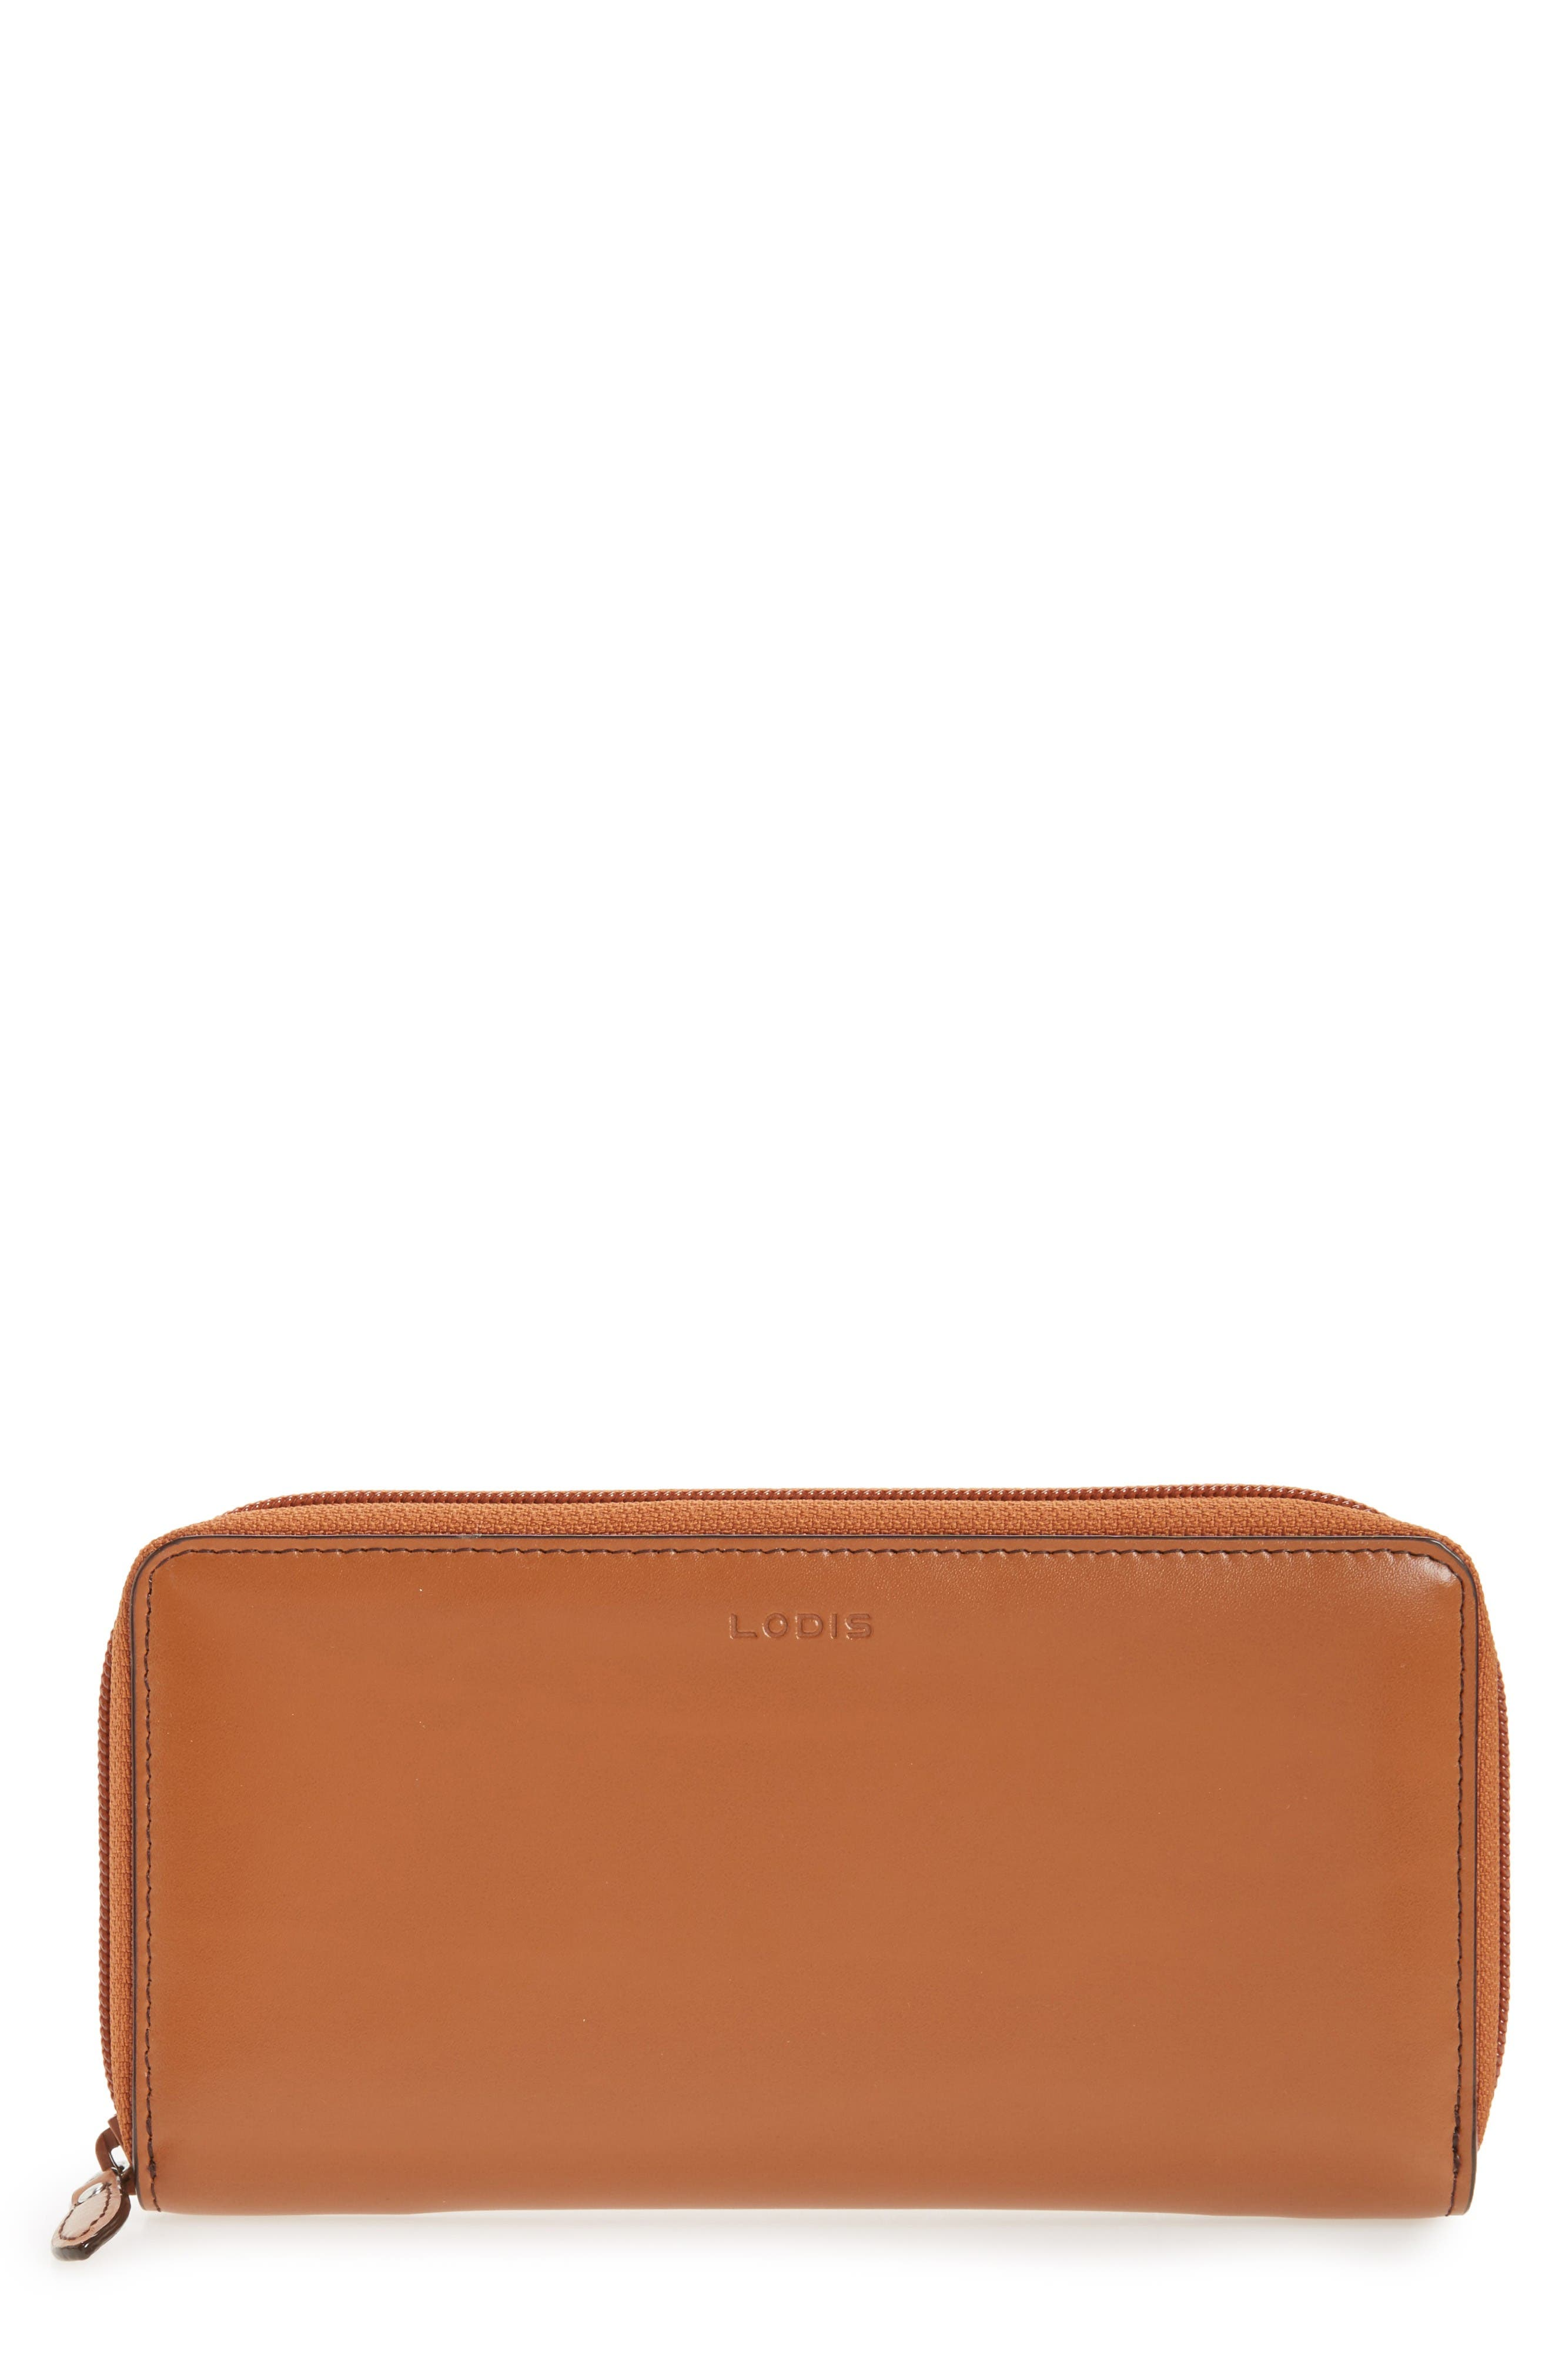 Main Image - Lodis Ada RFID Zip Around Wallet